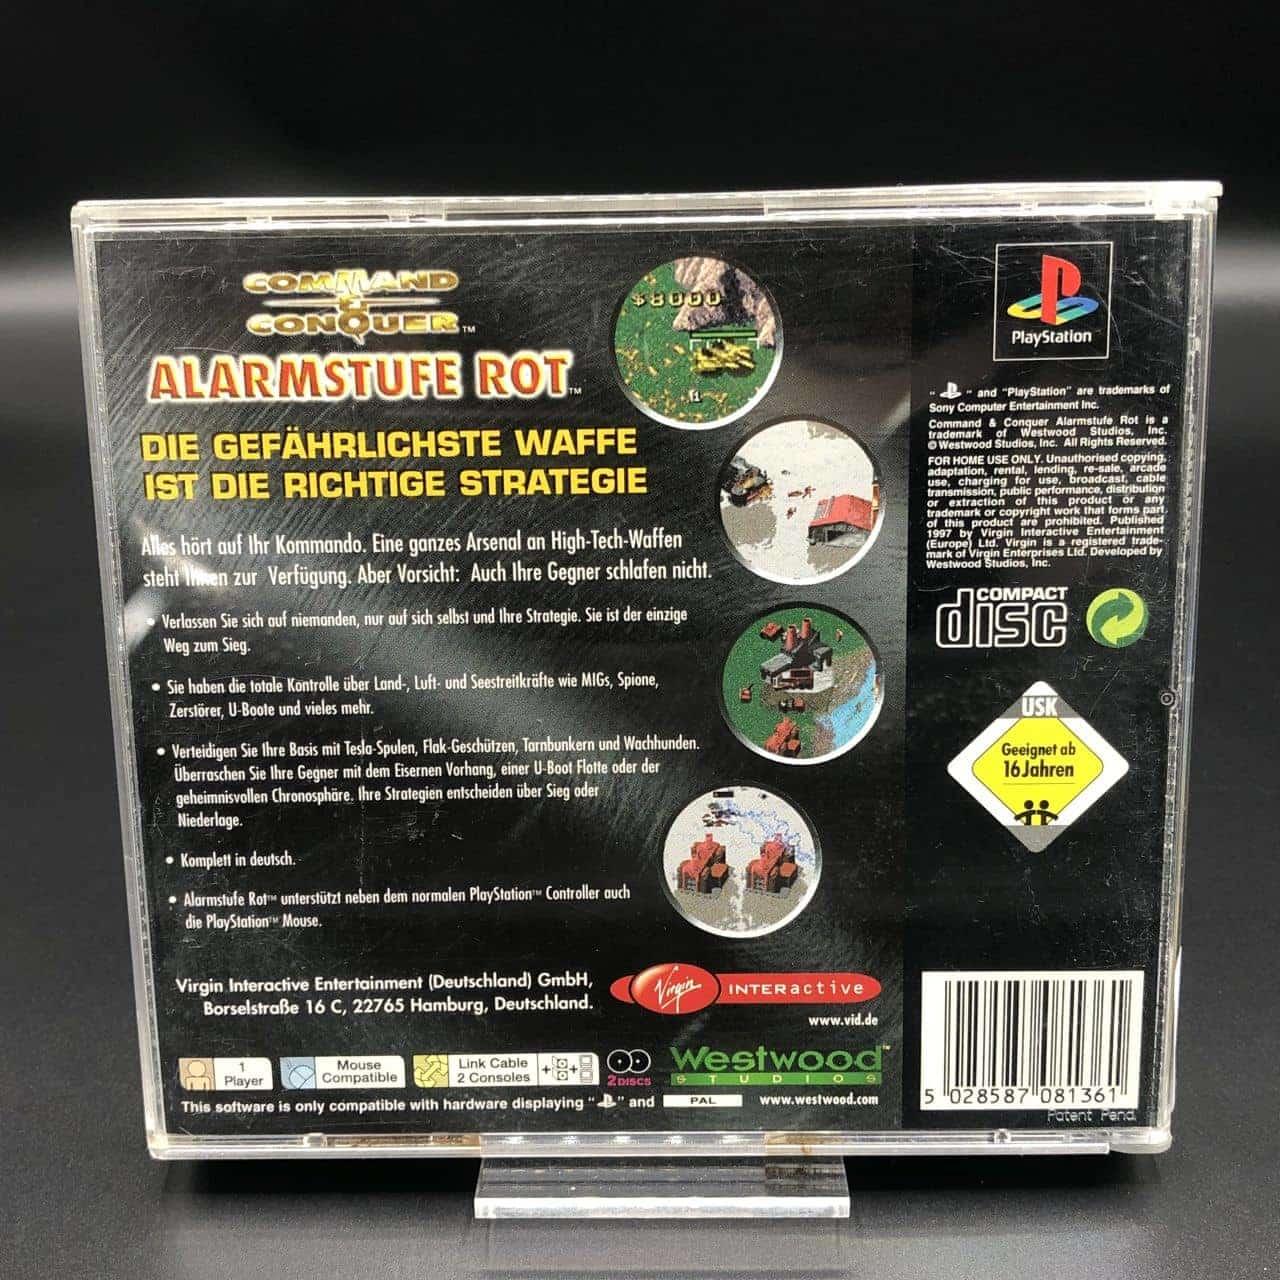 PS1 Command & Conquer: Alarmstufe Rot (Komplett) (Gebrauchsspuren) Sony PlayStation 1